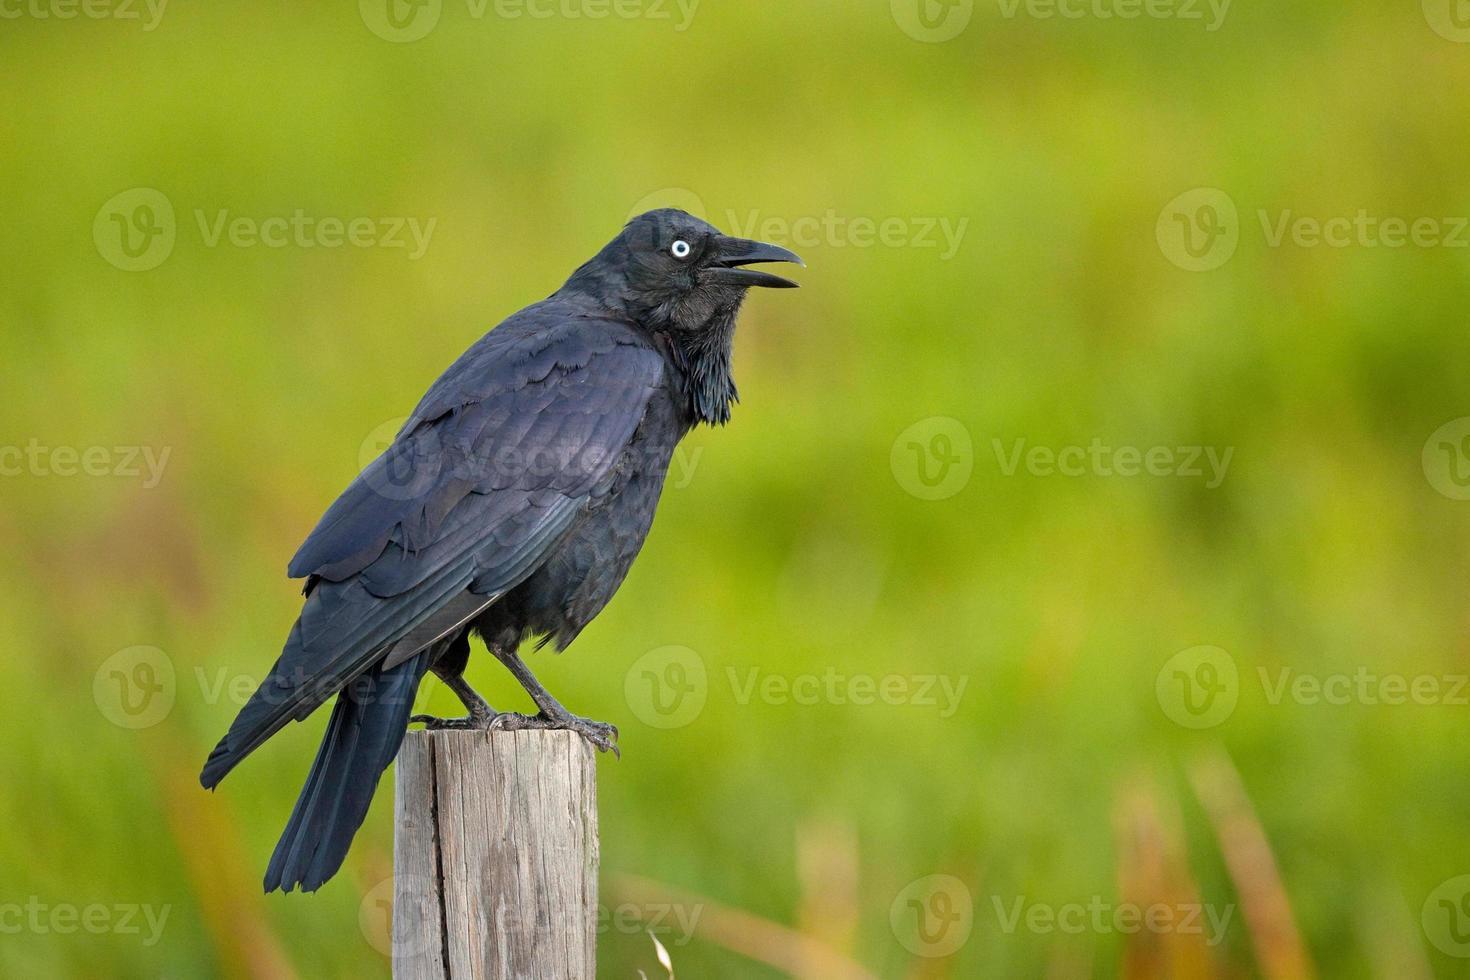 corvo australiano, corvus coronoides, em foco foto